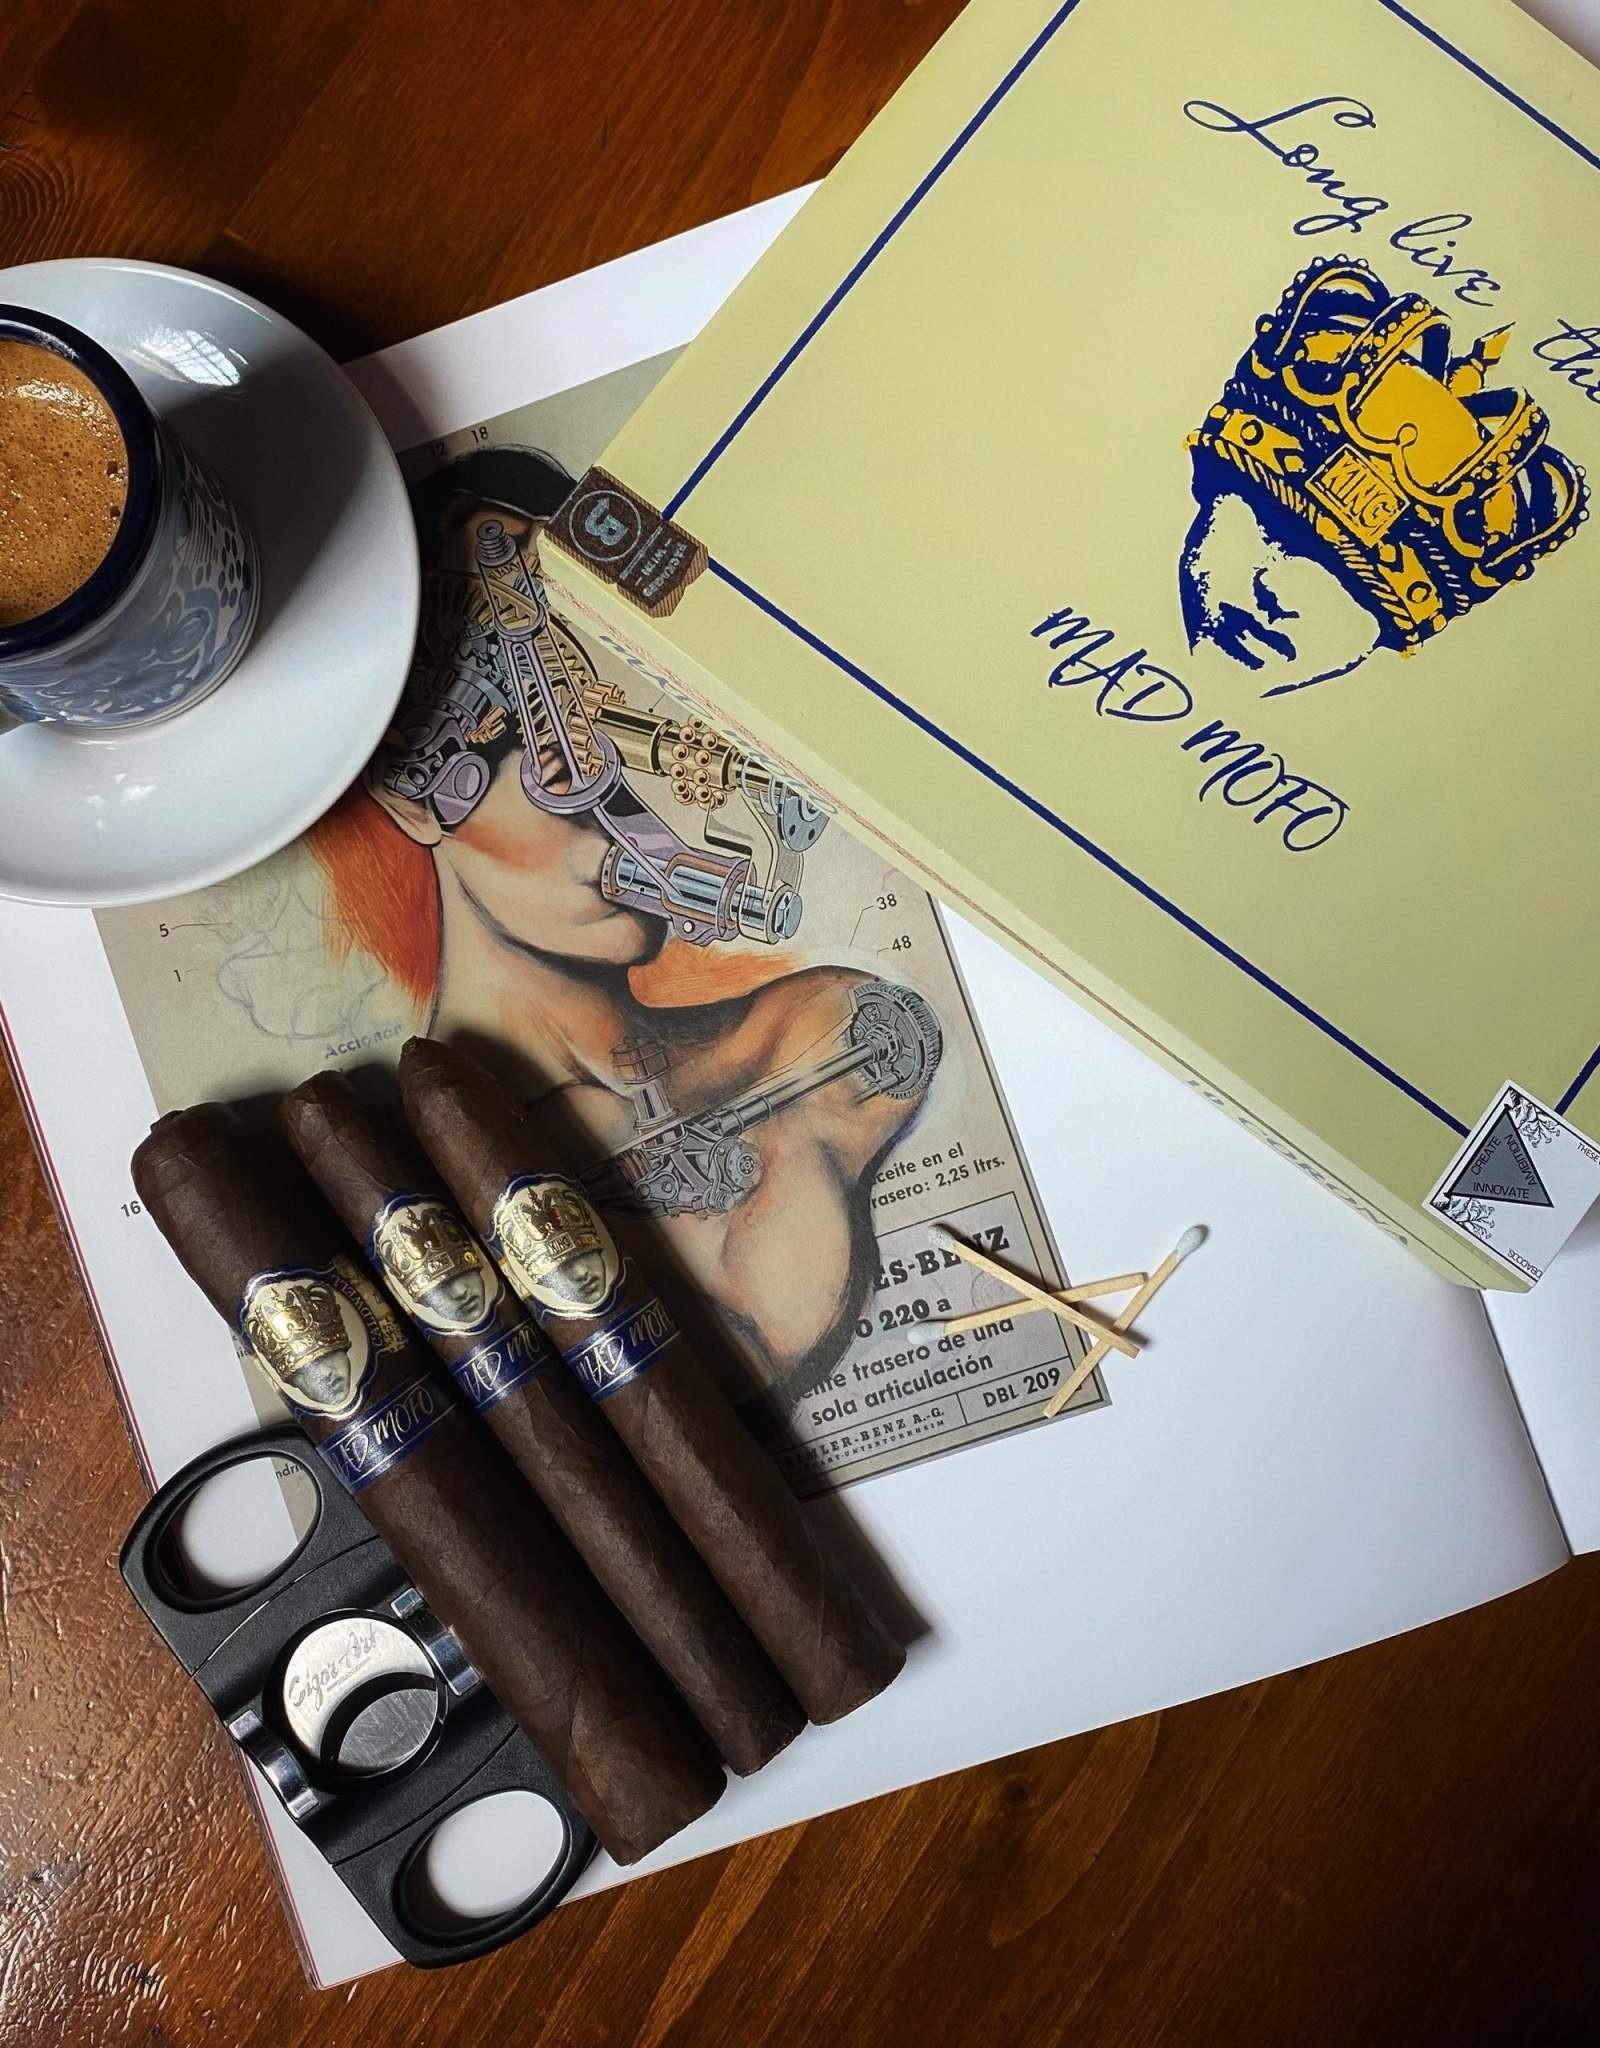 Caldwell Cigar Co Caldwell Long Live The King Mad Mofo Super Toro 6 x 54